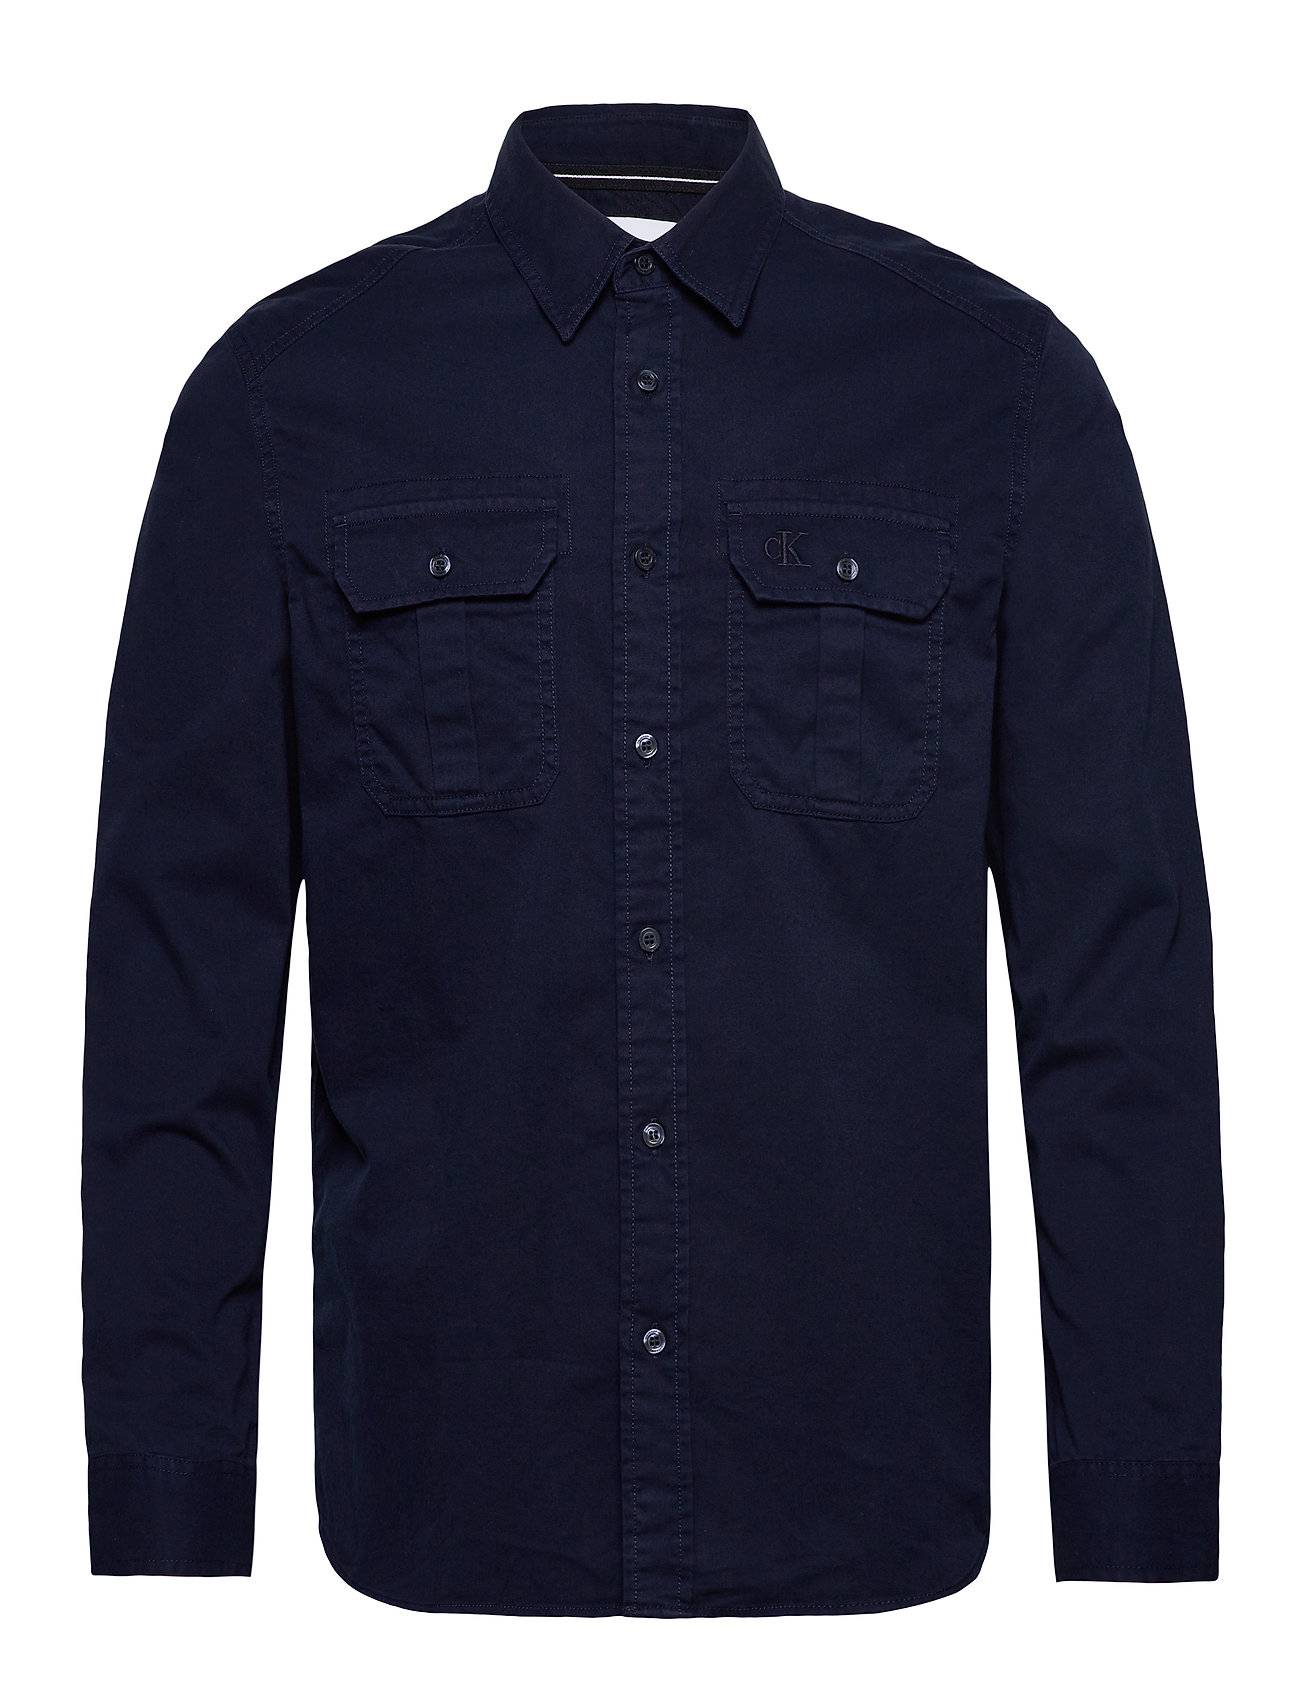 Image of Calvin Gmd Twill Utility Reg Shirt Paita Rento Casual Sininen Calvin Klein Jeans